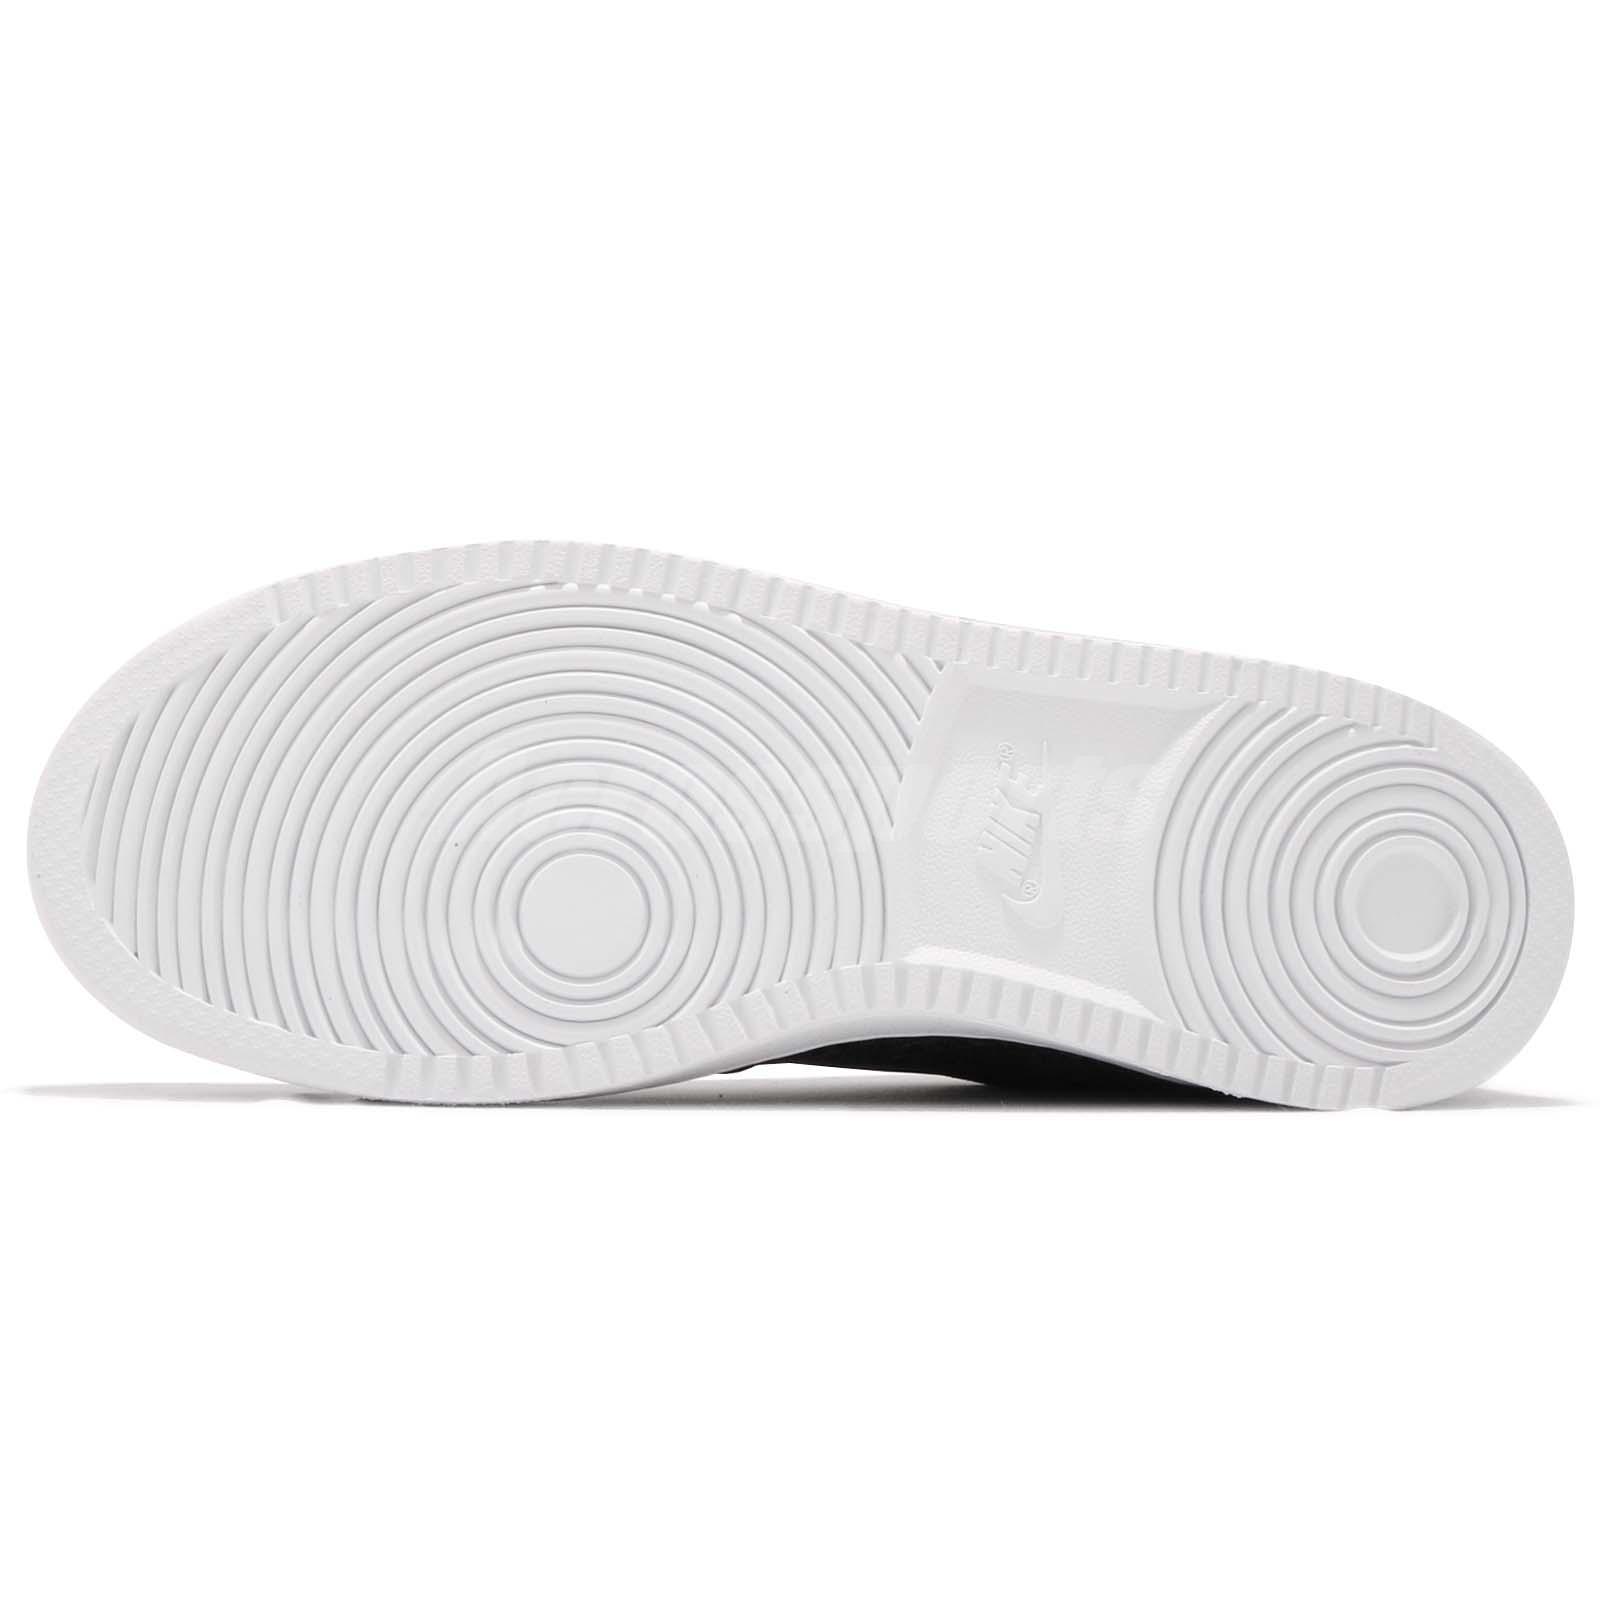 low priced 756fe c0f9c Nike Ebernon Low PREM Premium Black White Men Casual Shoes Sneakers ...